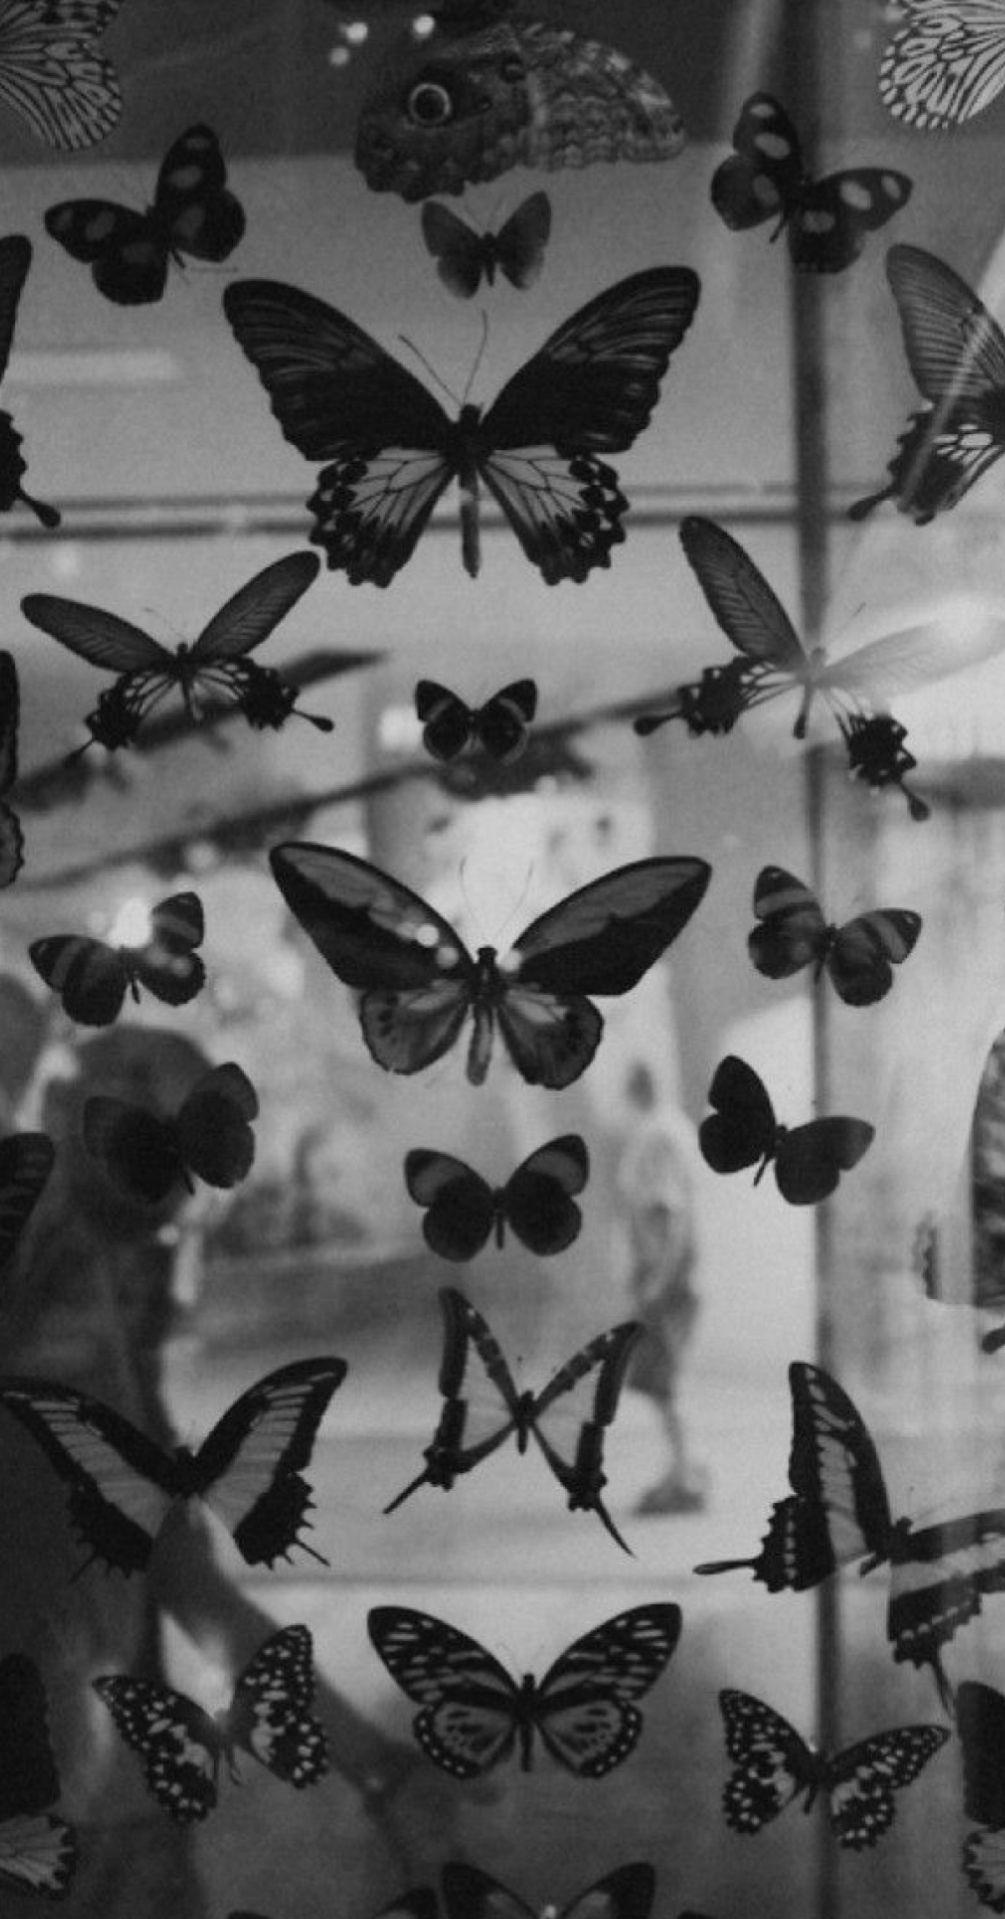 Pinterest Elana Black Aesthetic Wallpaper Black And White Picture Wall Black Aesthetic